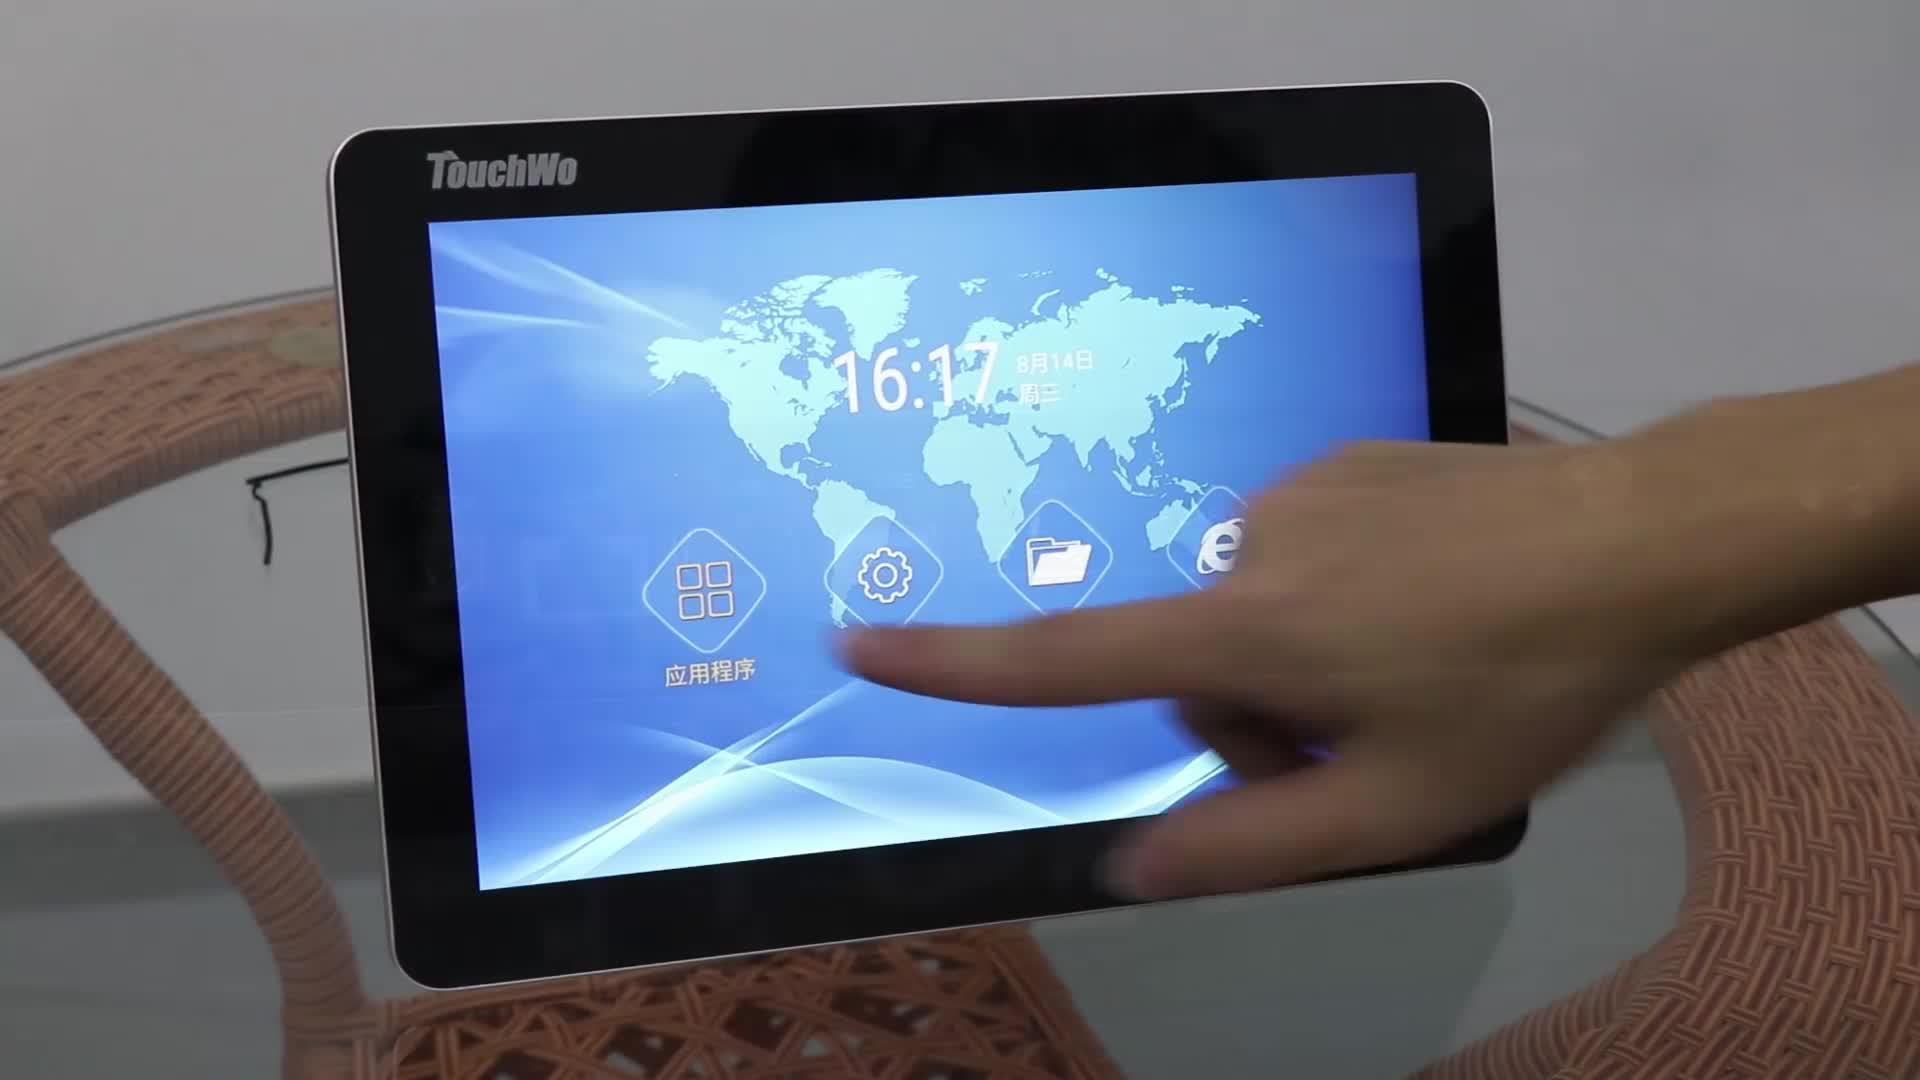 10,1 pulgadas de pantalla táctil capacitiva LCD todo en uno PC con J1900 procesador